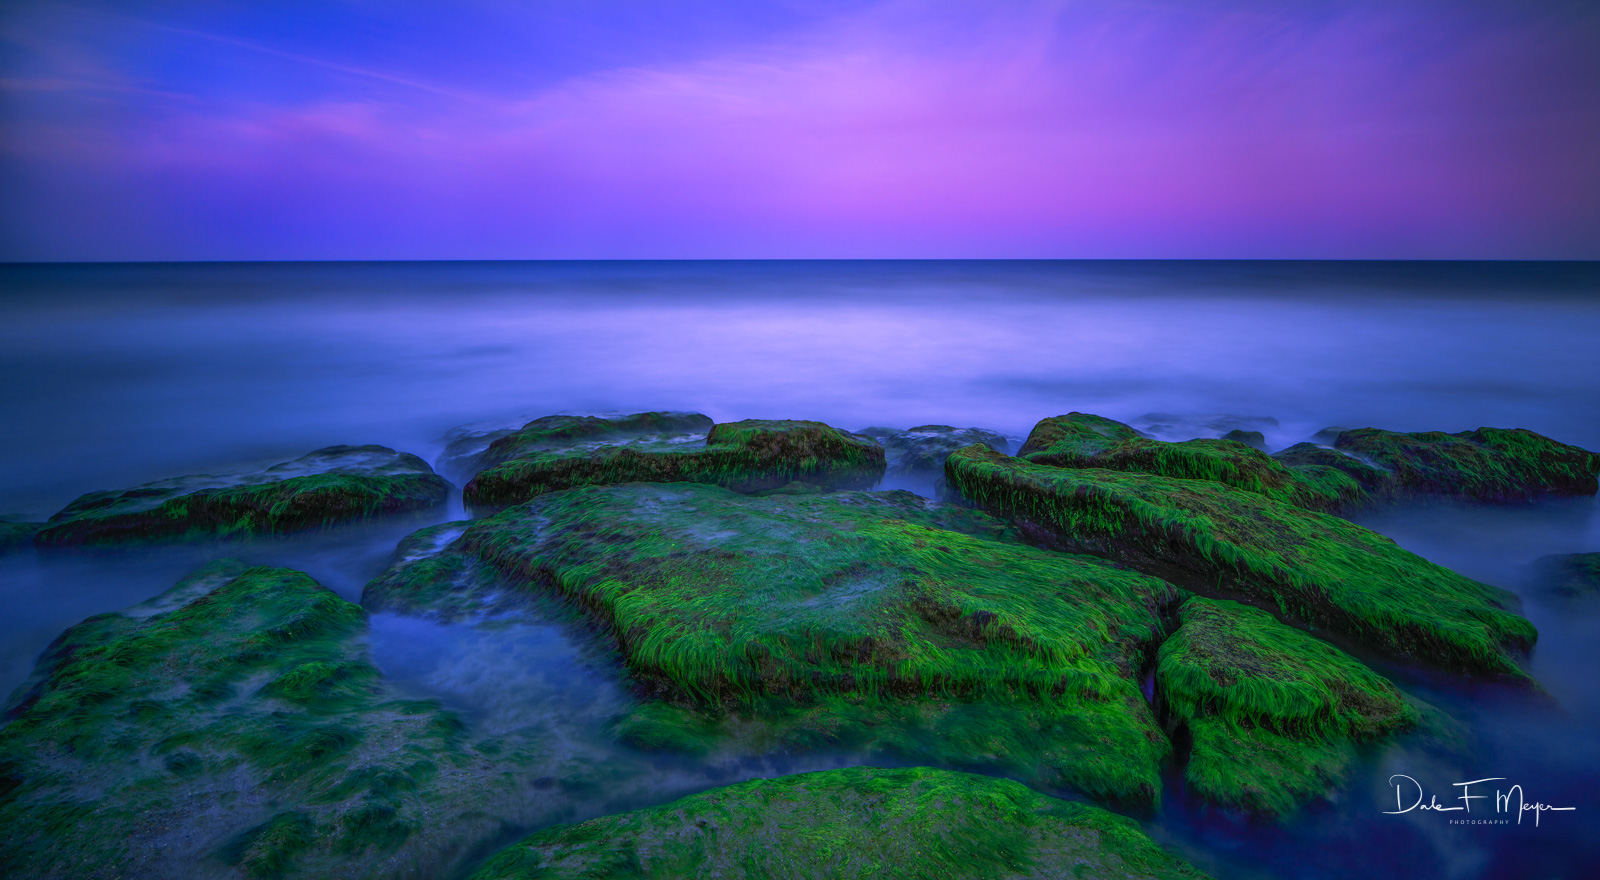 coastal, Coastal Photos of the Eastern Seabord Gallerie, Coquina Rocks, Evening Light, long exposure, North Carolina